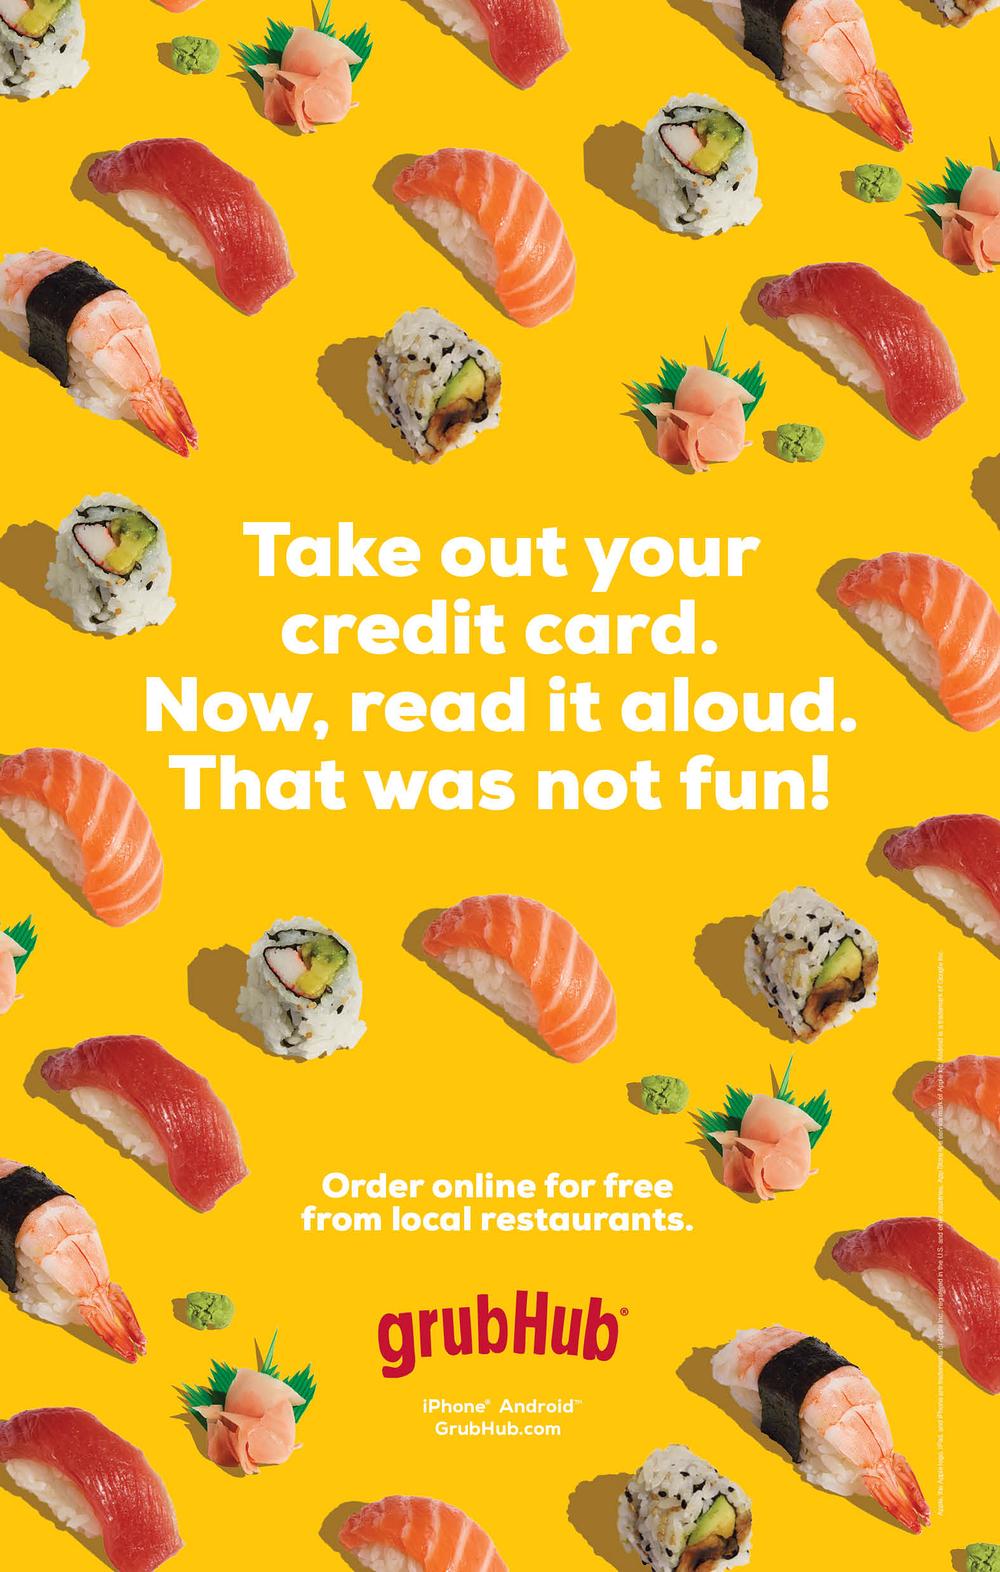 GrubHub Campaign I, 2015   Agency: Barton F Graf  Food Styling: Chris Lanier  Retouching: Suk Choi